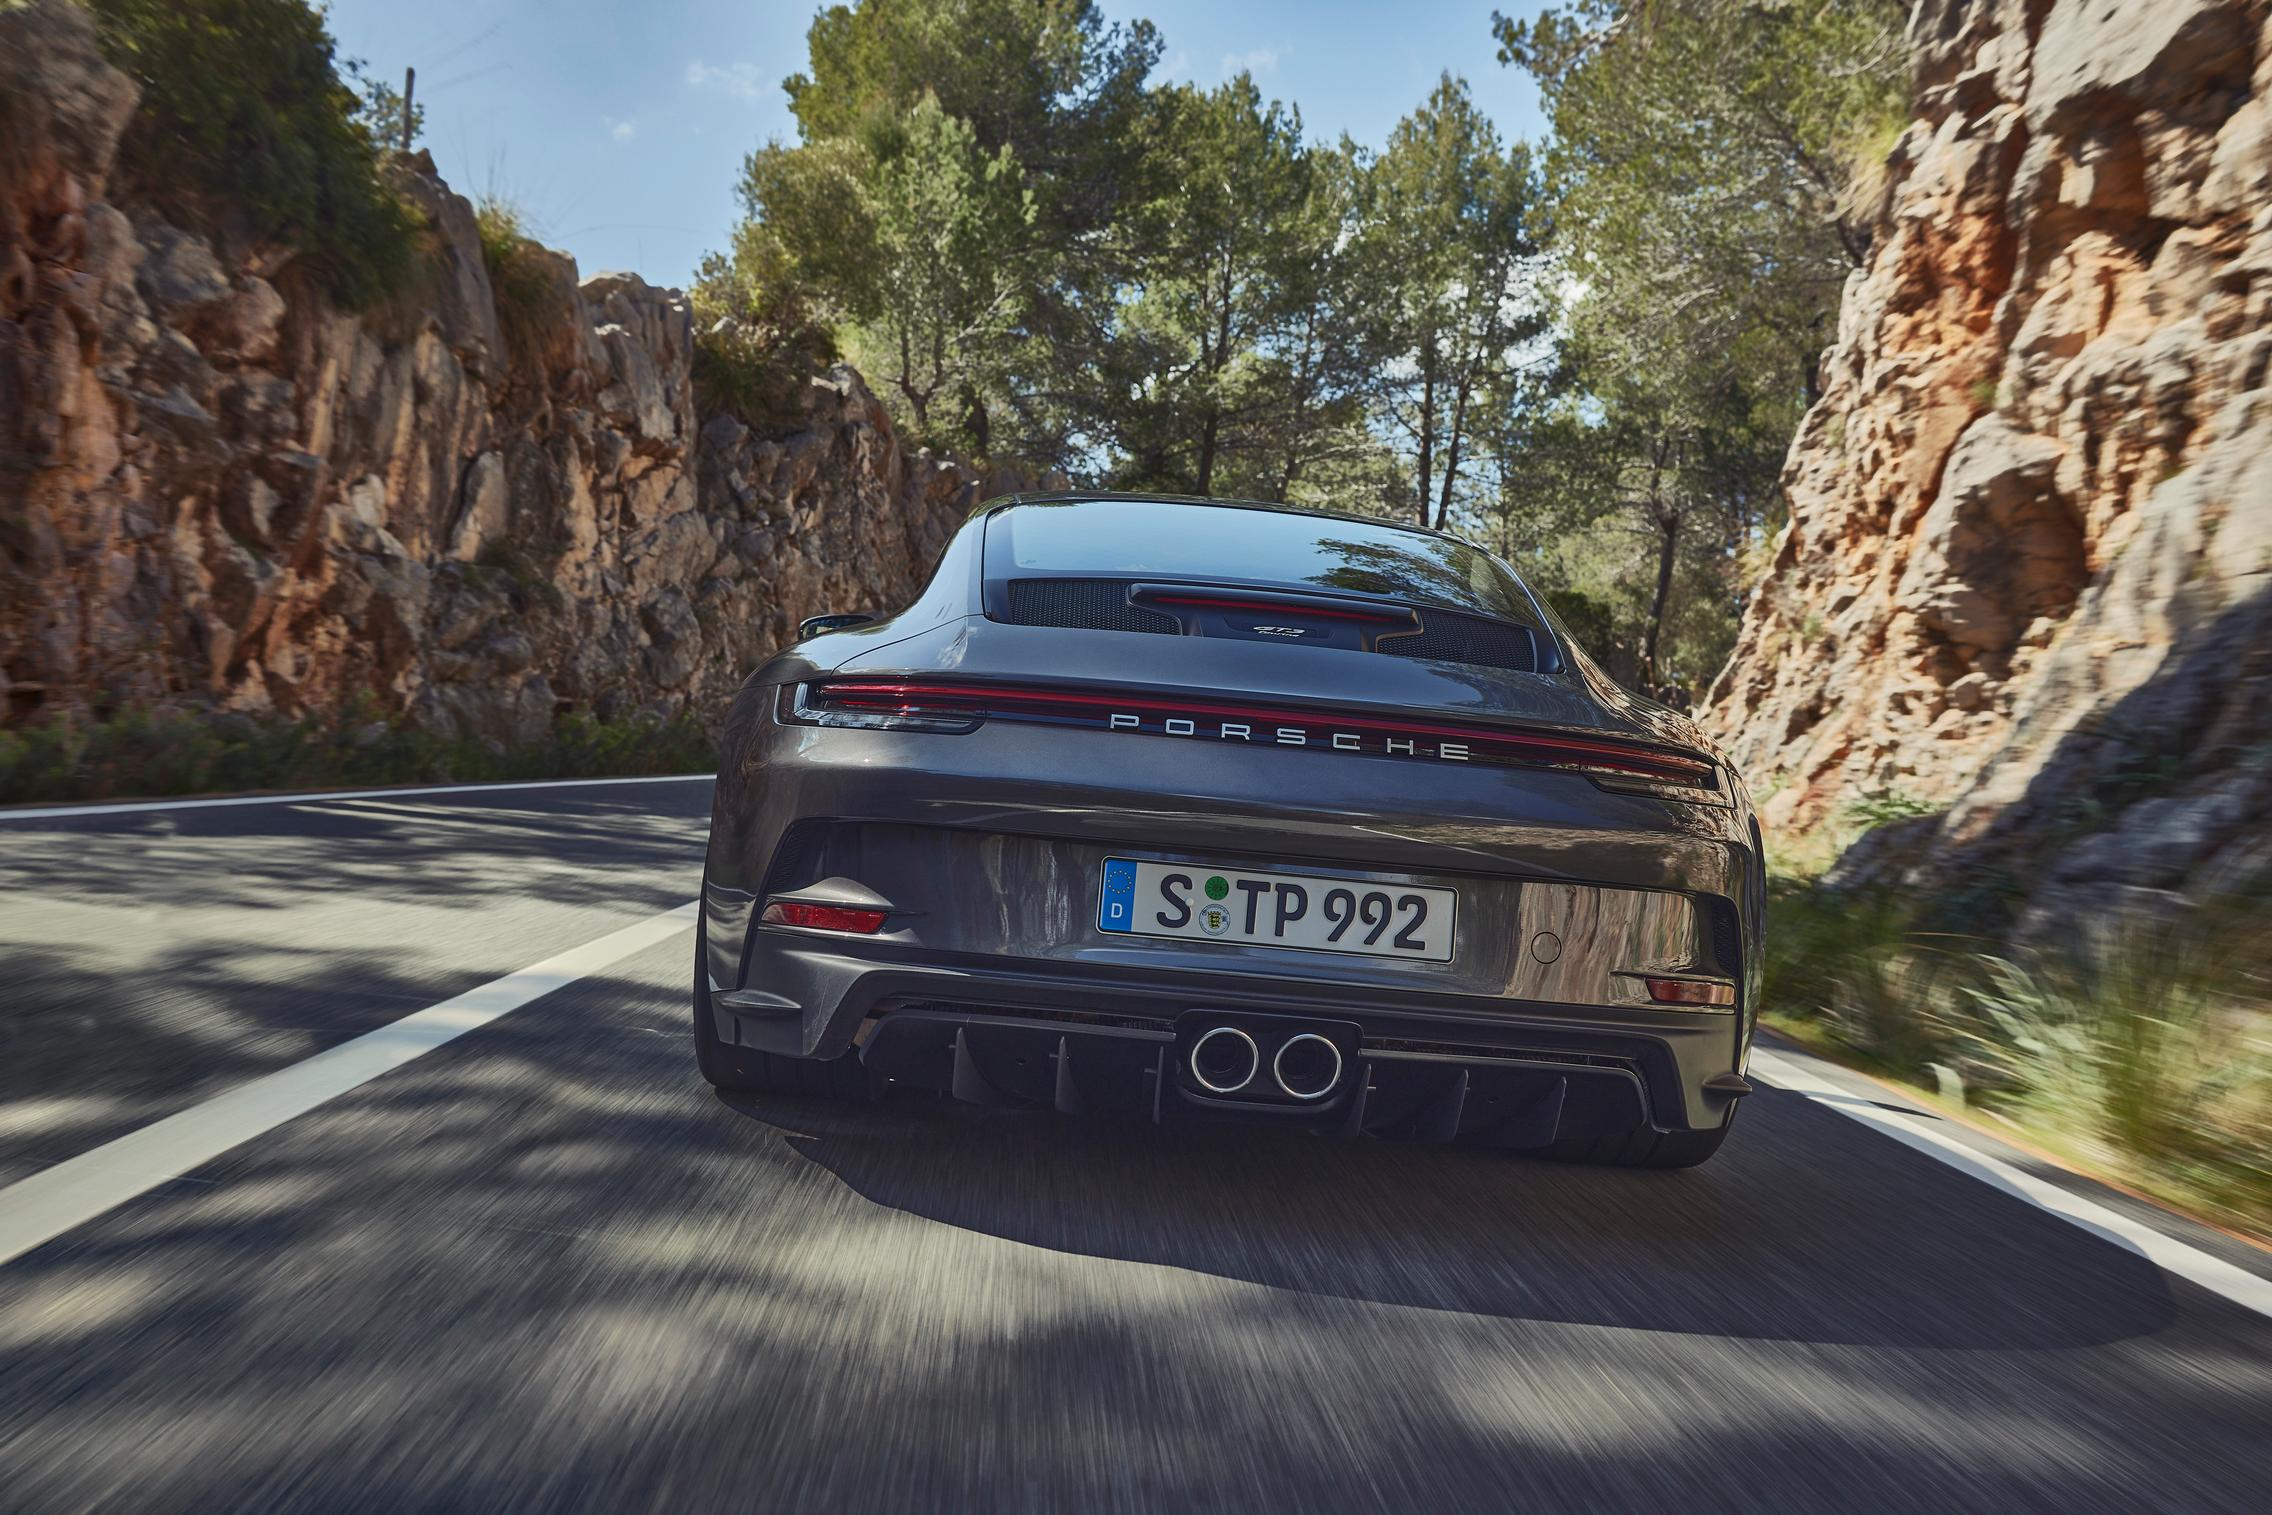 Porsche 992 GT3 Touring rear